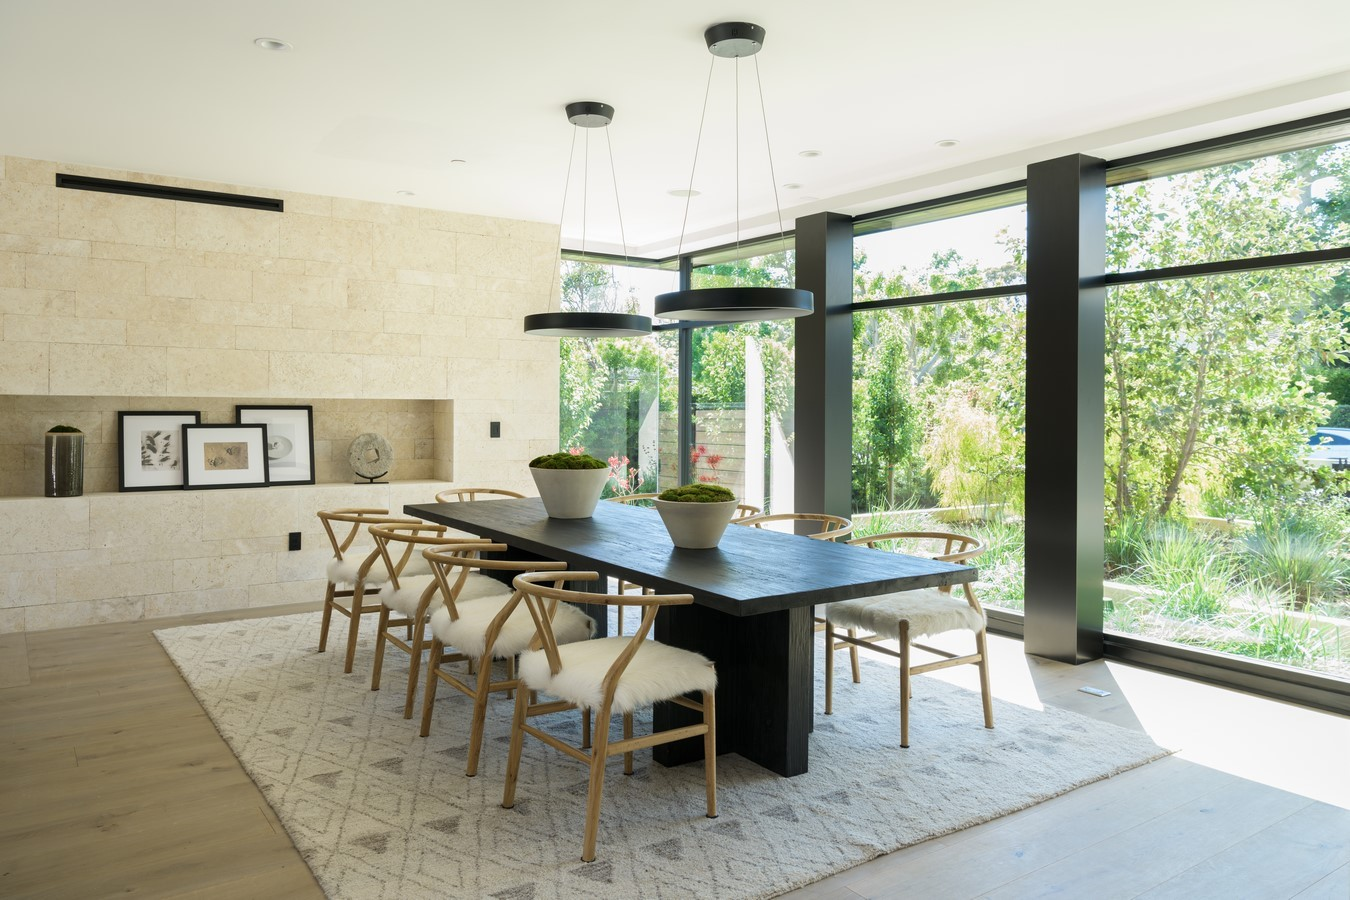 Amalfi Drive Residen By Michael Lee Architects - Sheet2